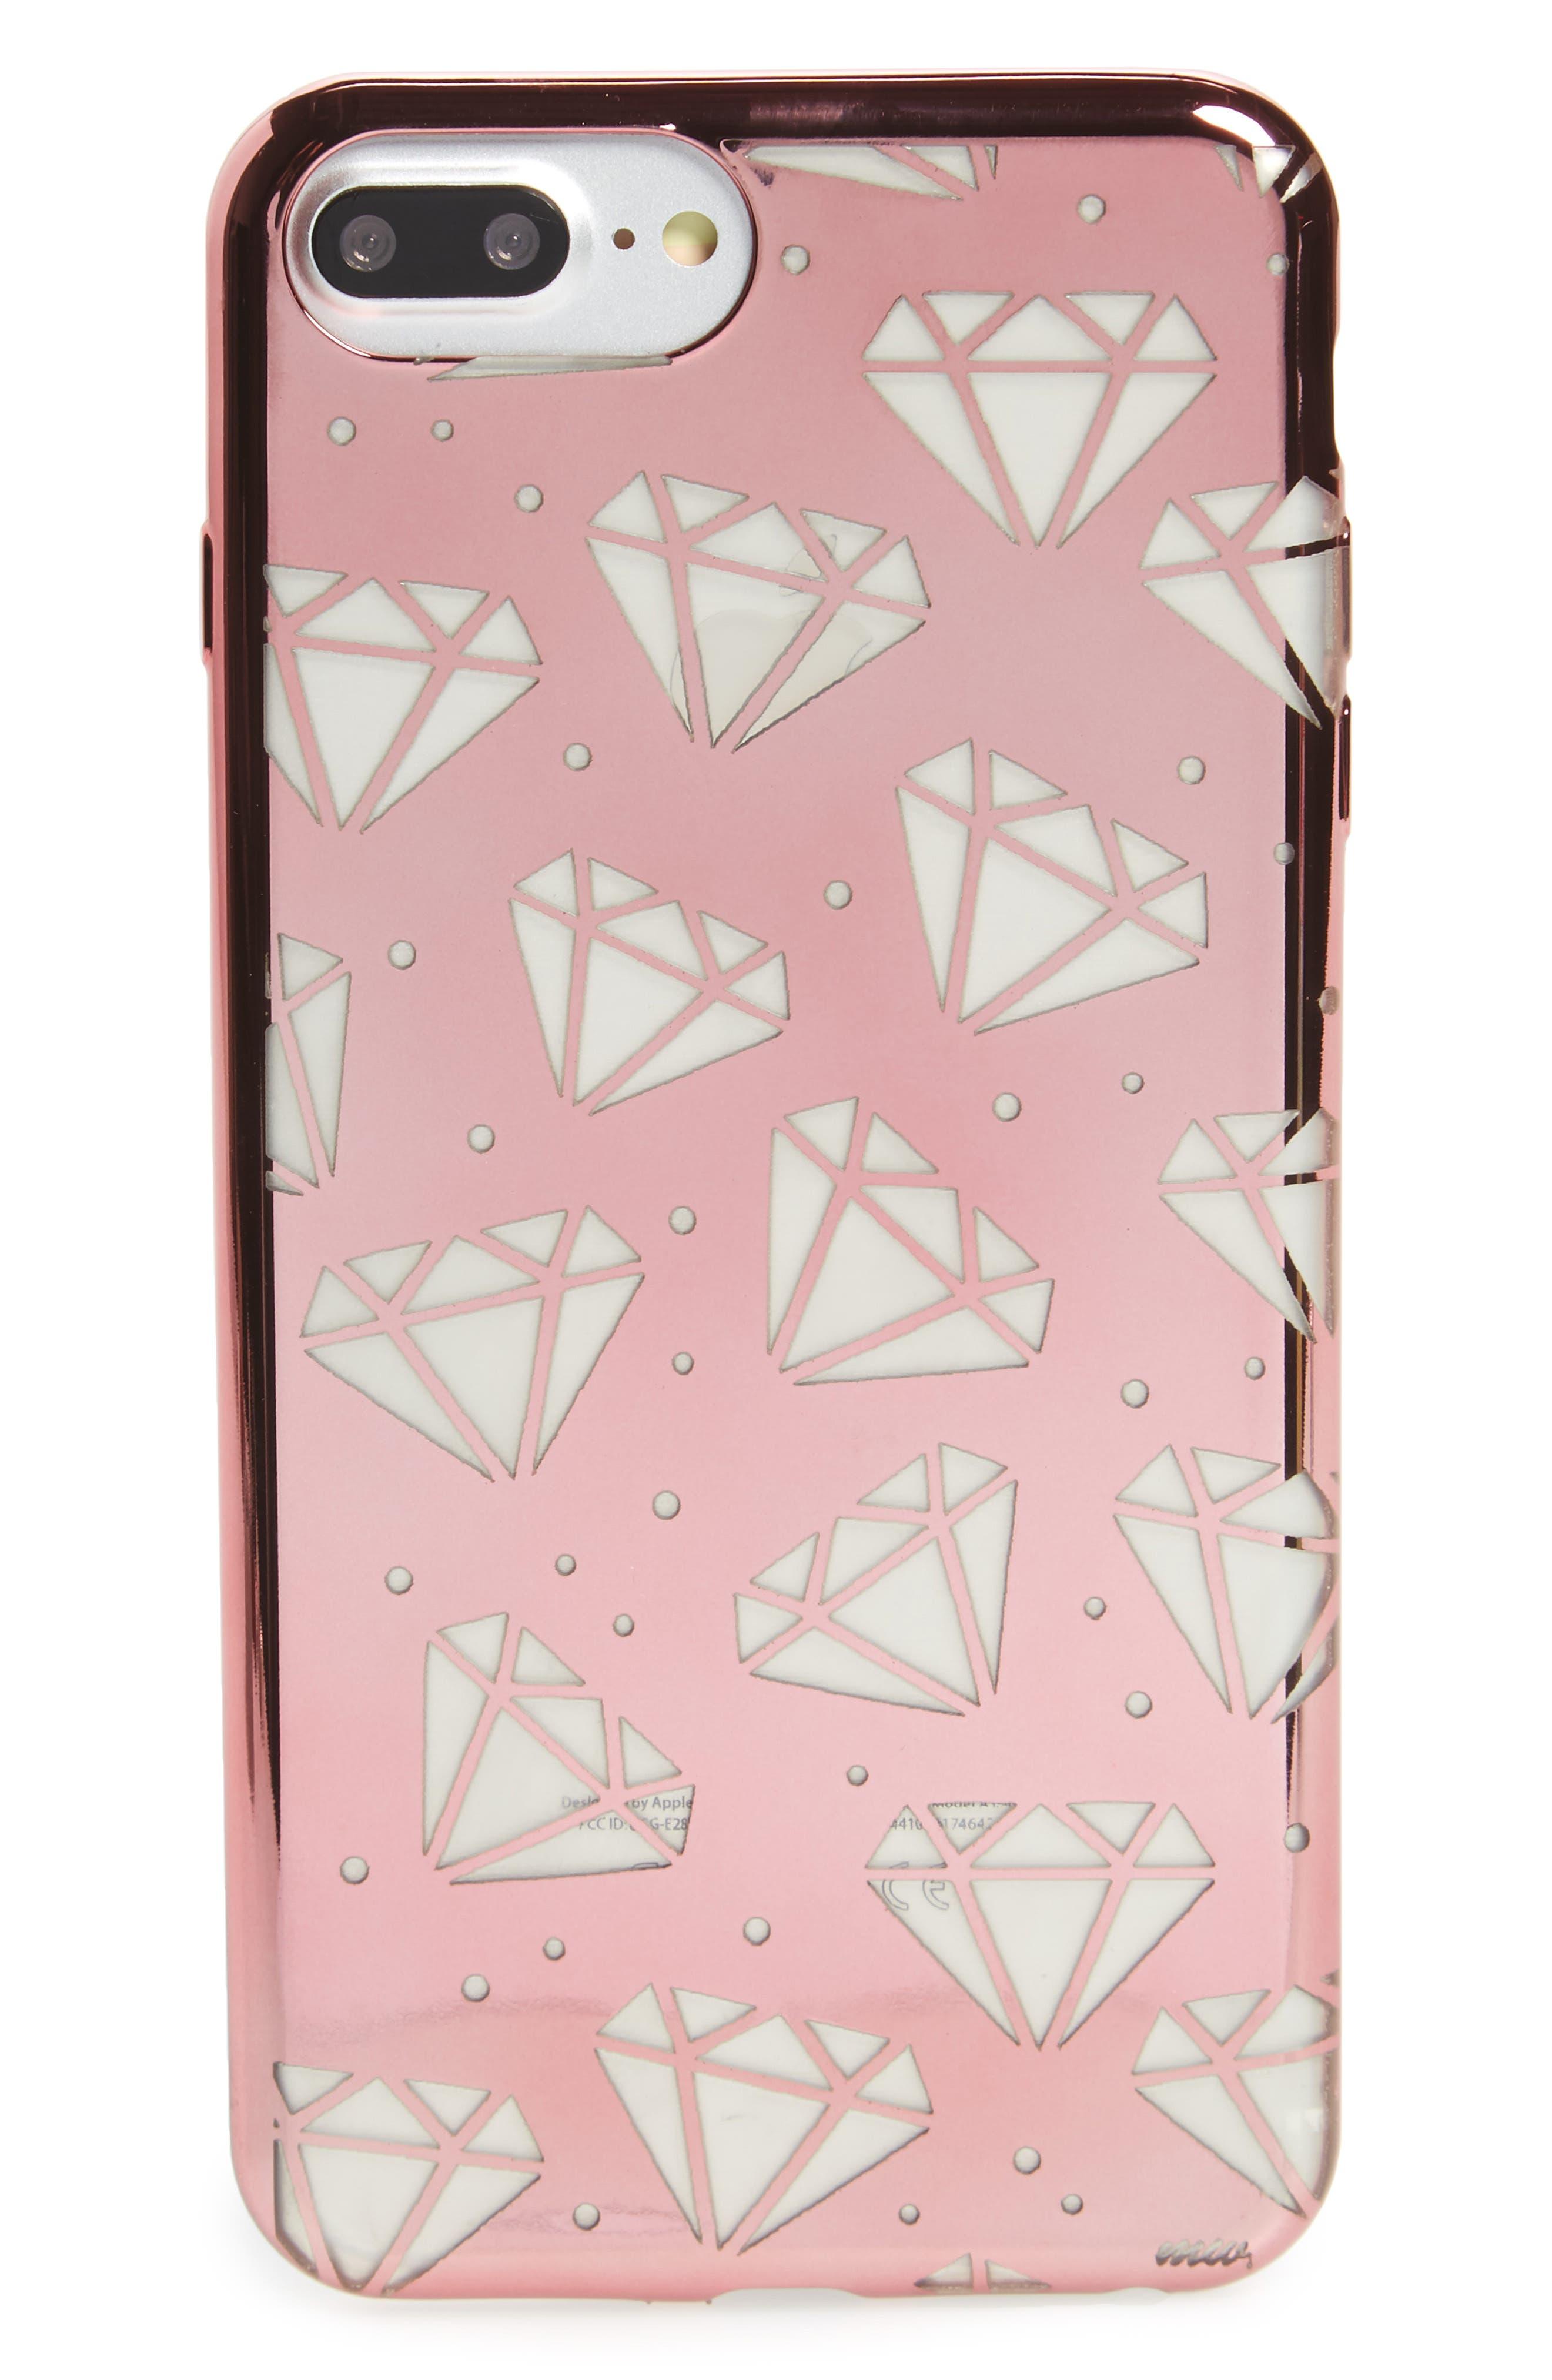 Main Image - MILKYWAY Galactic Diamonds iPhone 6/6s/7 Case